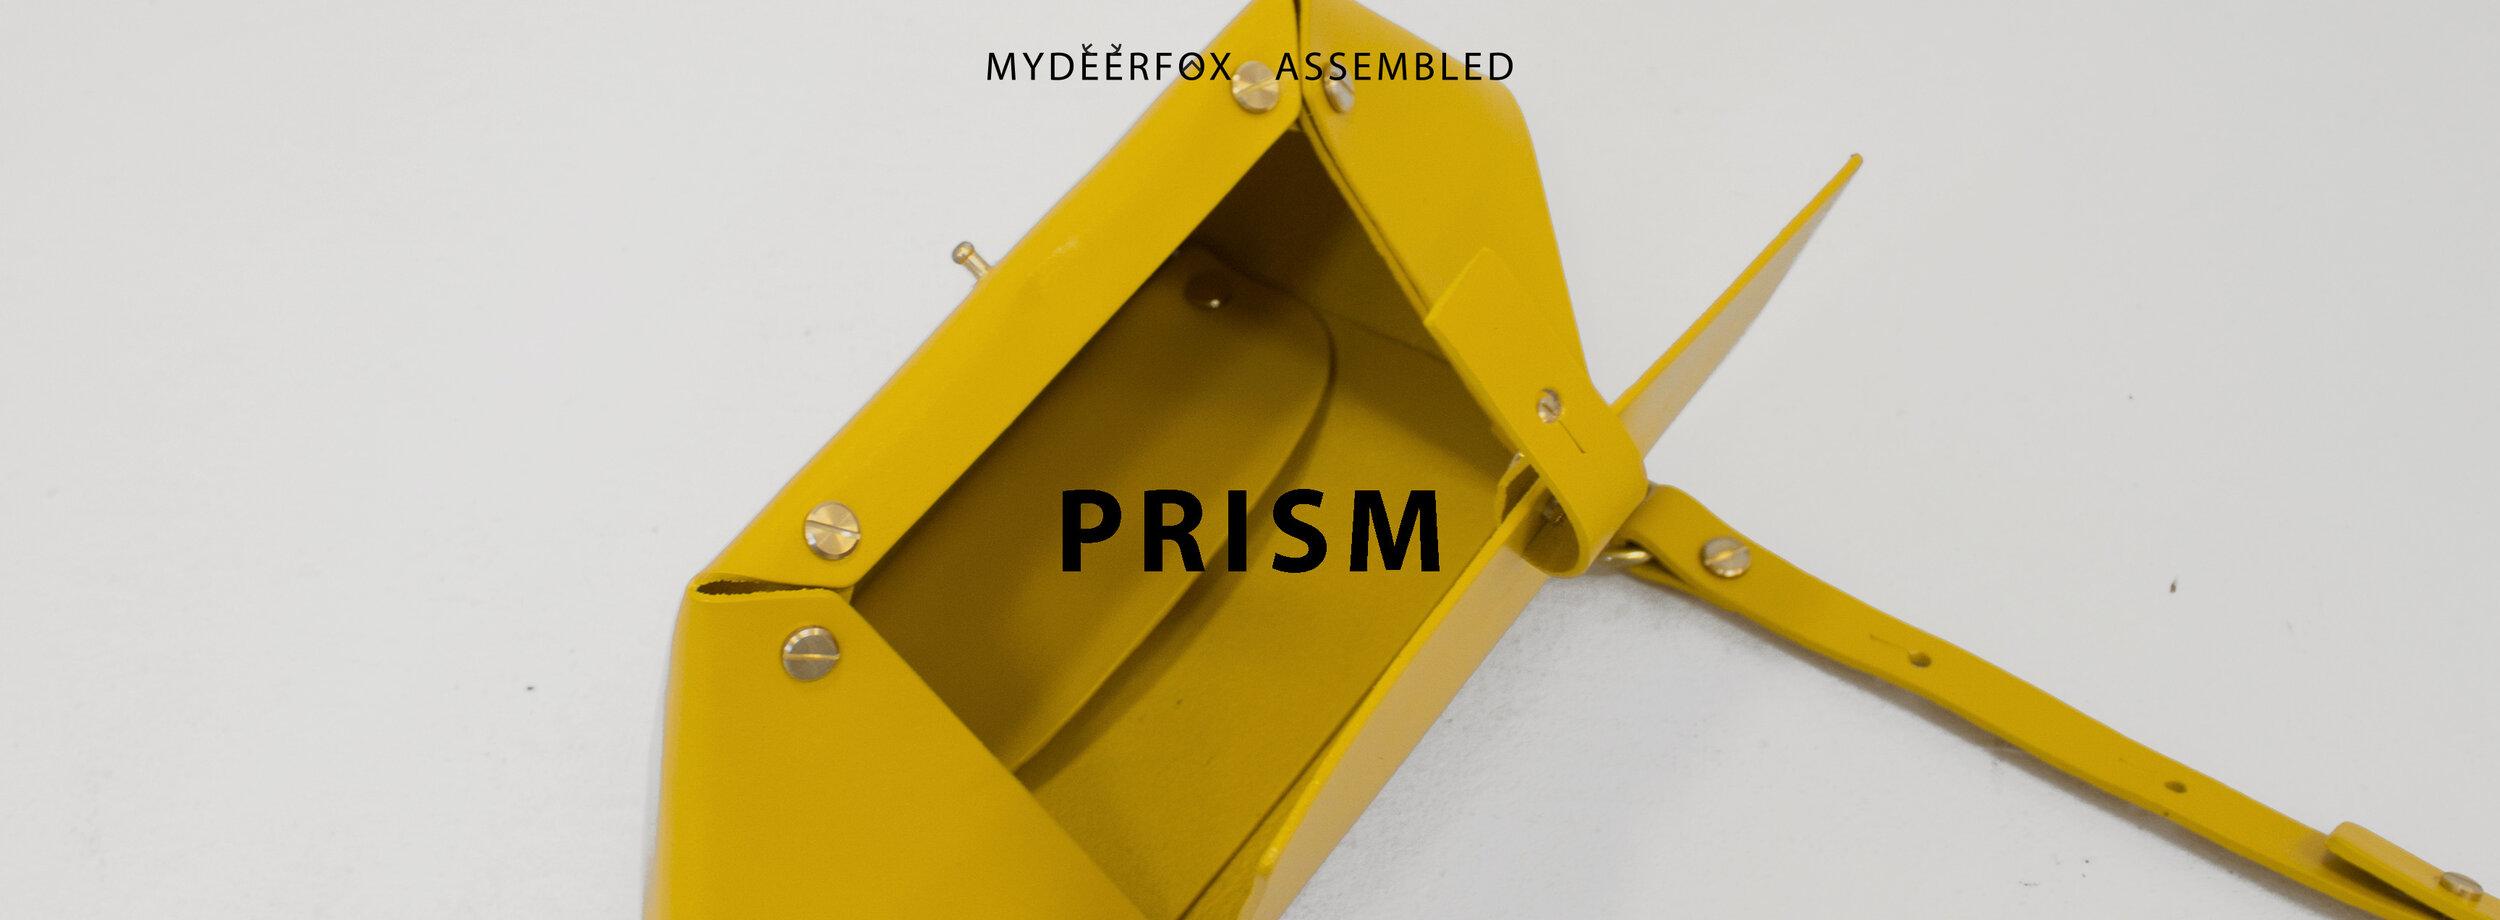 MYDEERFOX_PRISM_BANNER